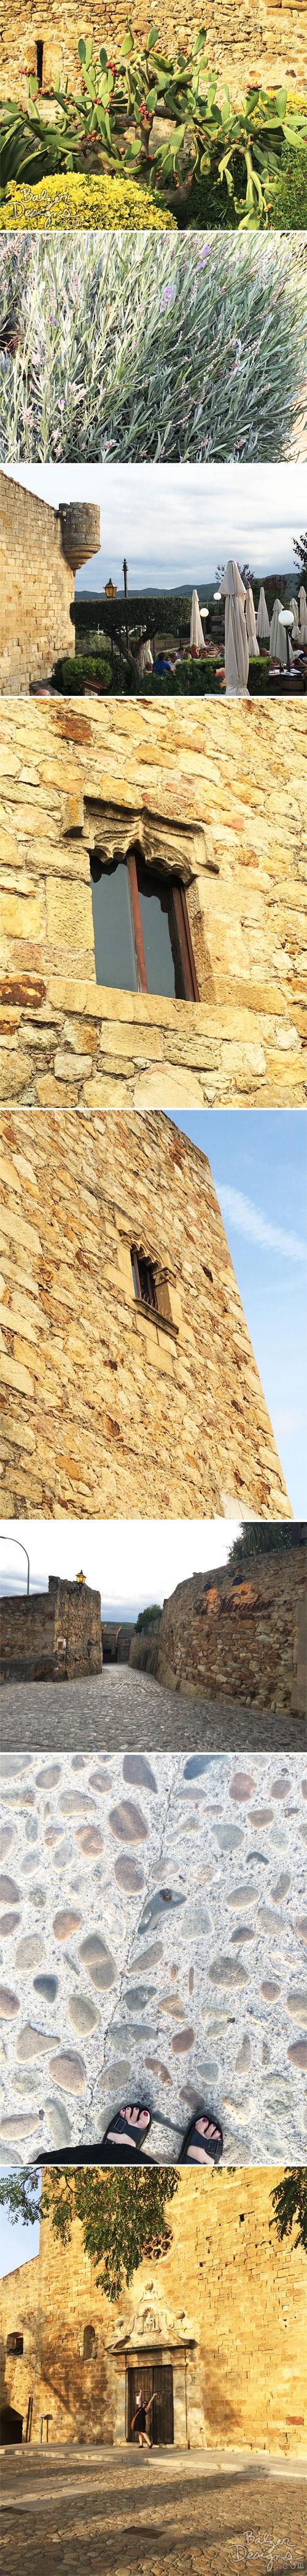 From the Balzer Designs Blog:Medieval Village: Peratallada